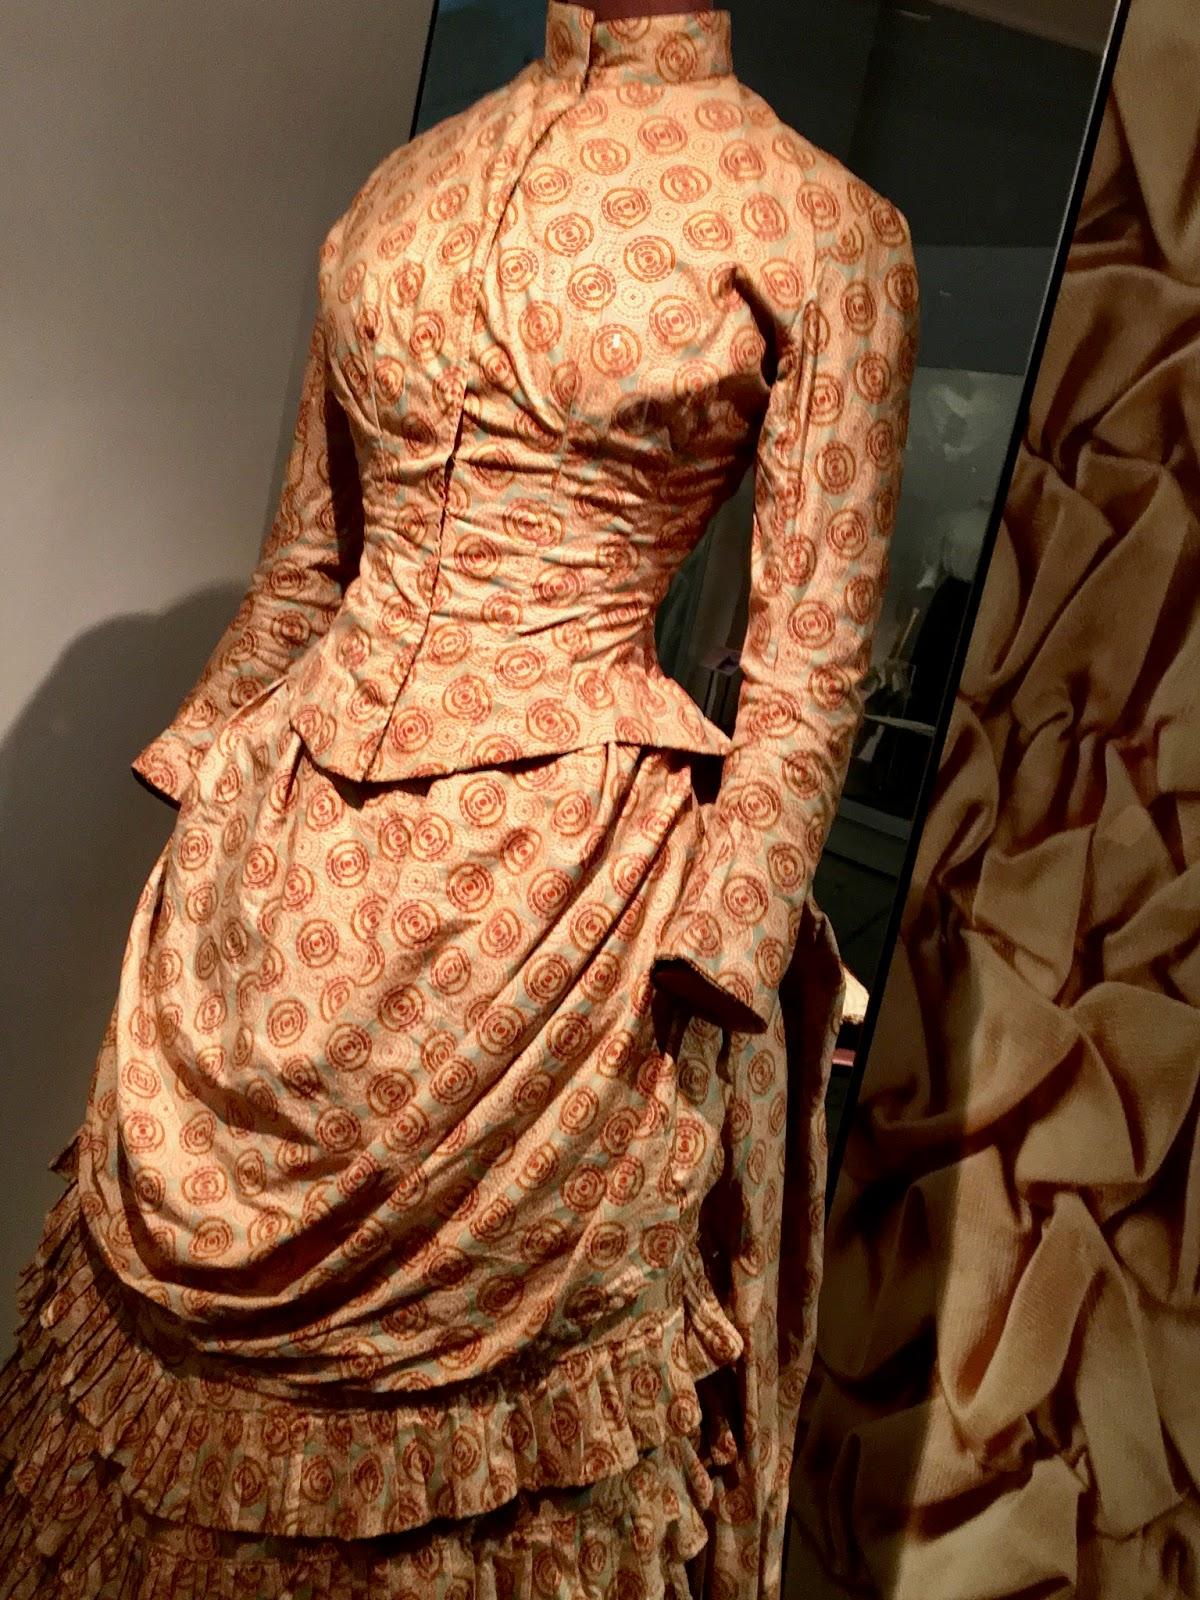 Historic Patterned Corset Dress V&A